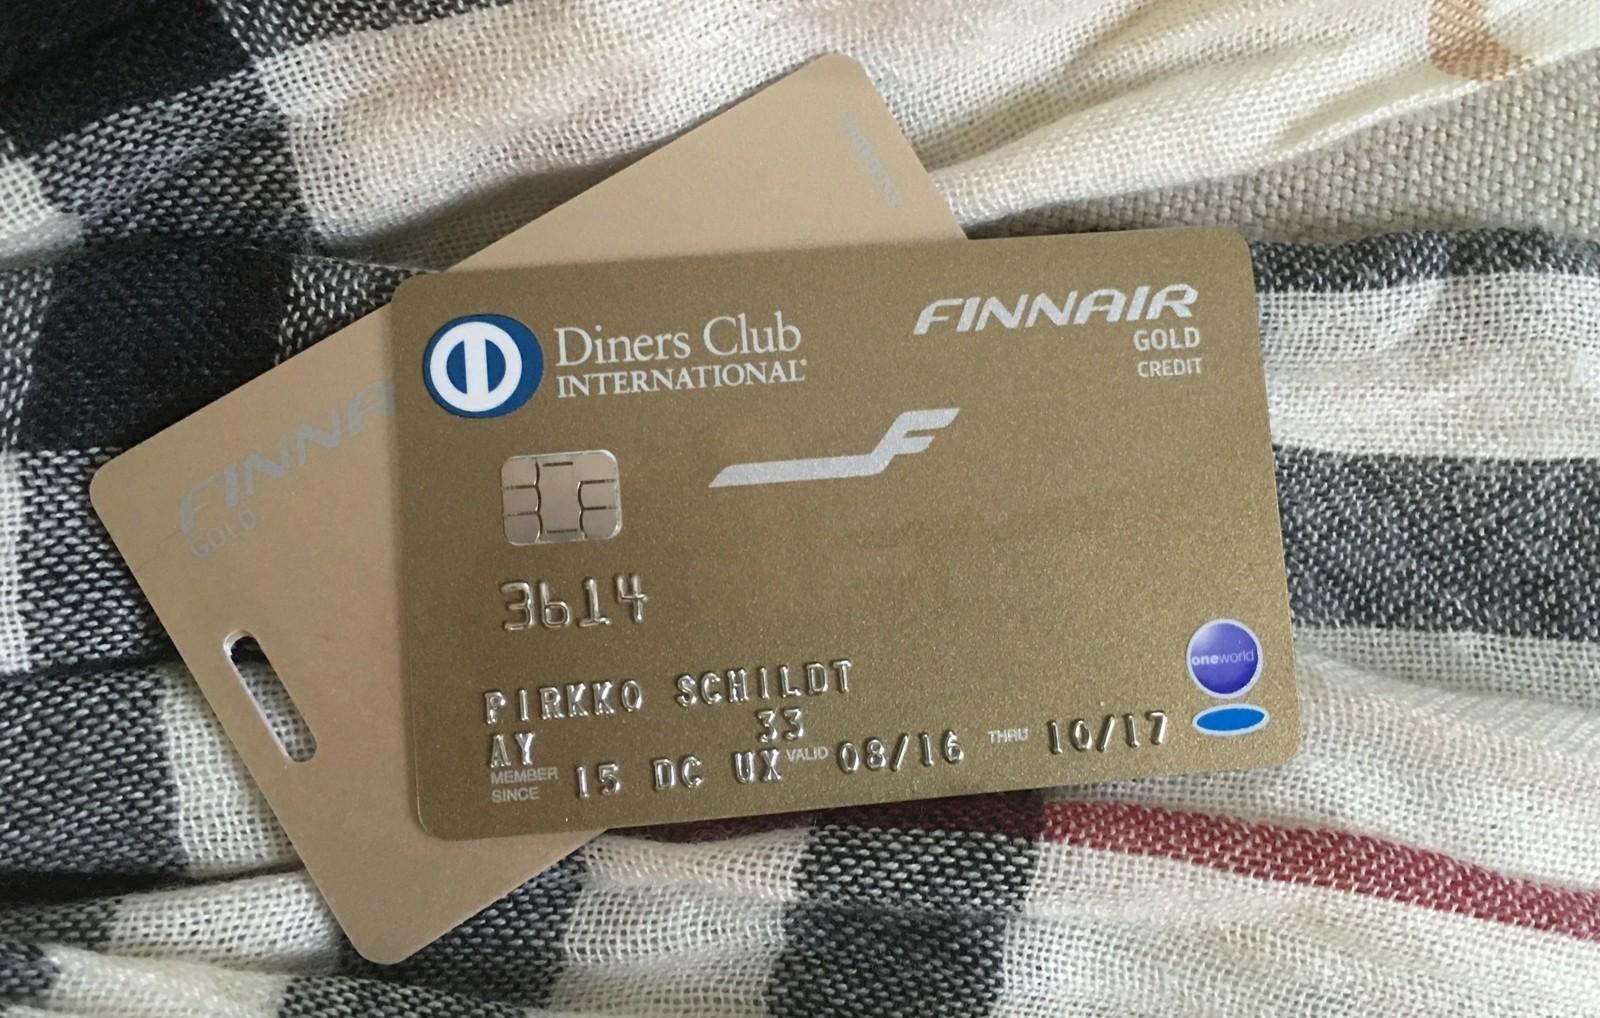 Finnair Gold